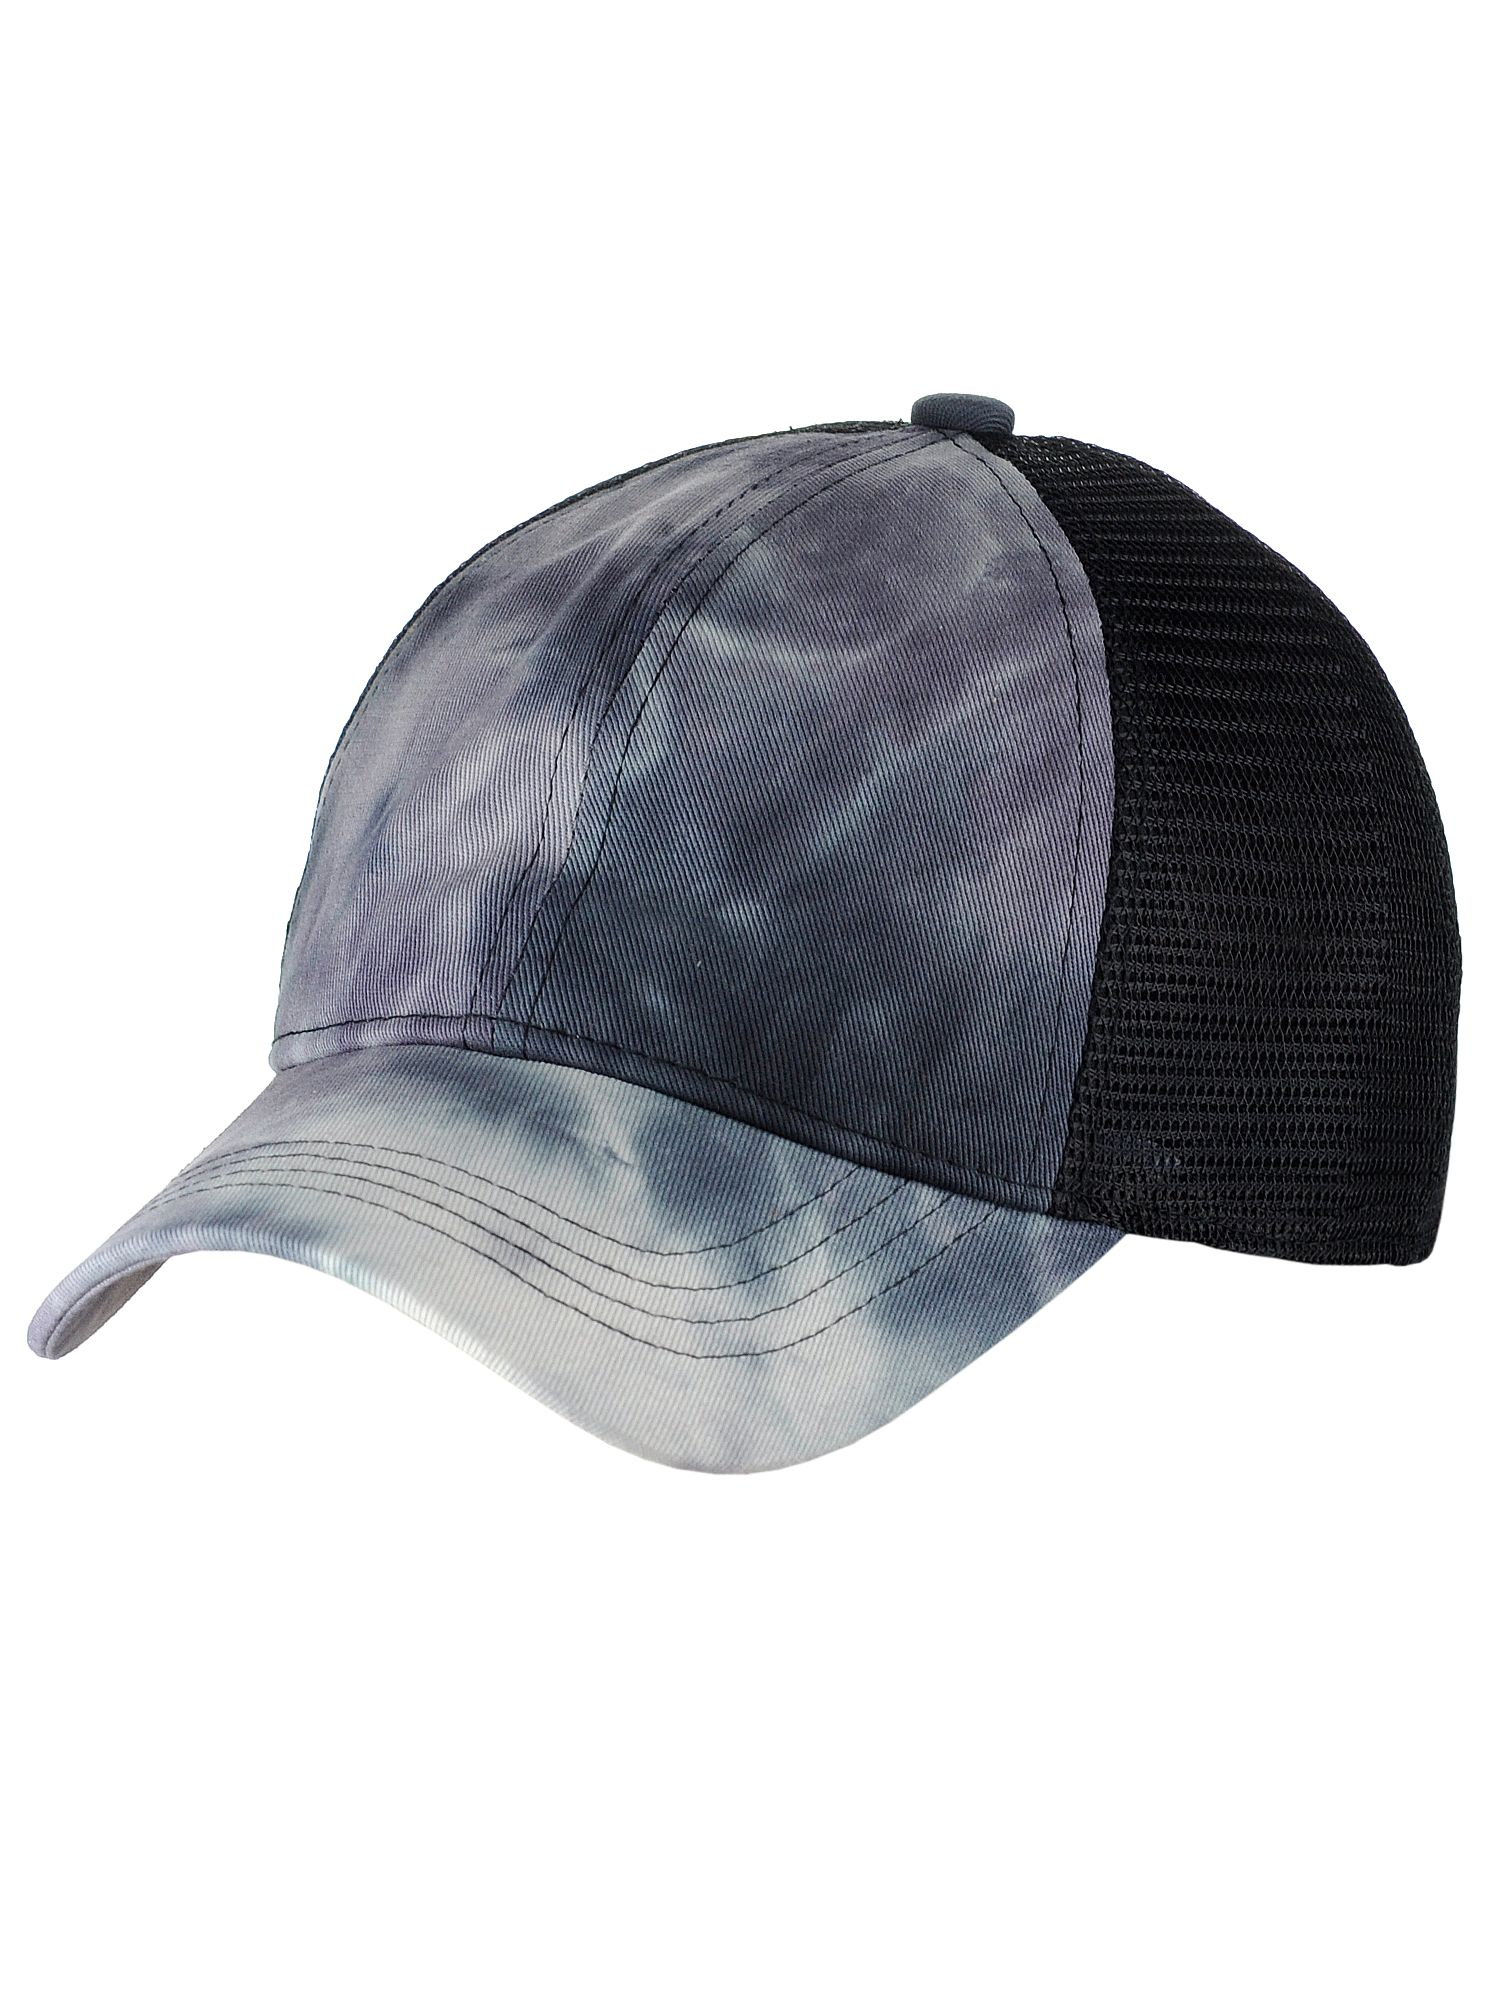 C.C Ponycap Messy High Bun Ponytail Adjustable Mesh Trucker Baseball Cap Hat, Tie Dye Black